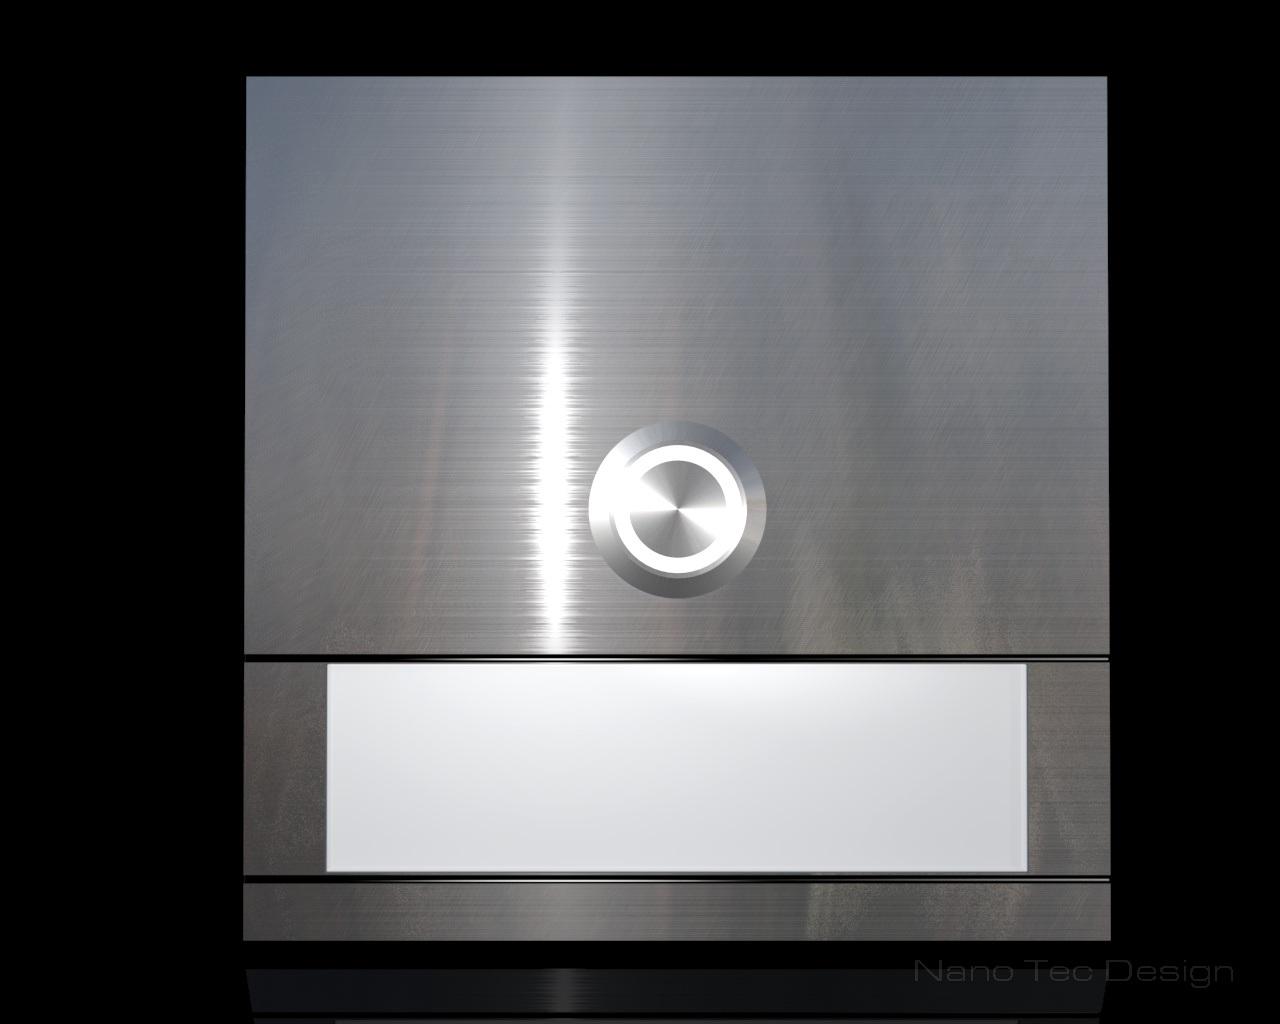 Design Edelstahlklingel mit Led-Beleuchtung